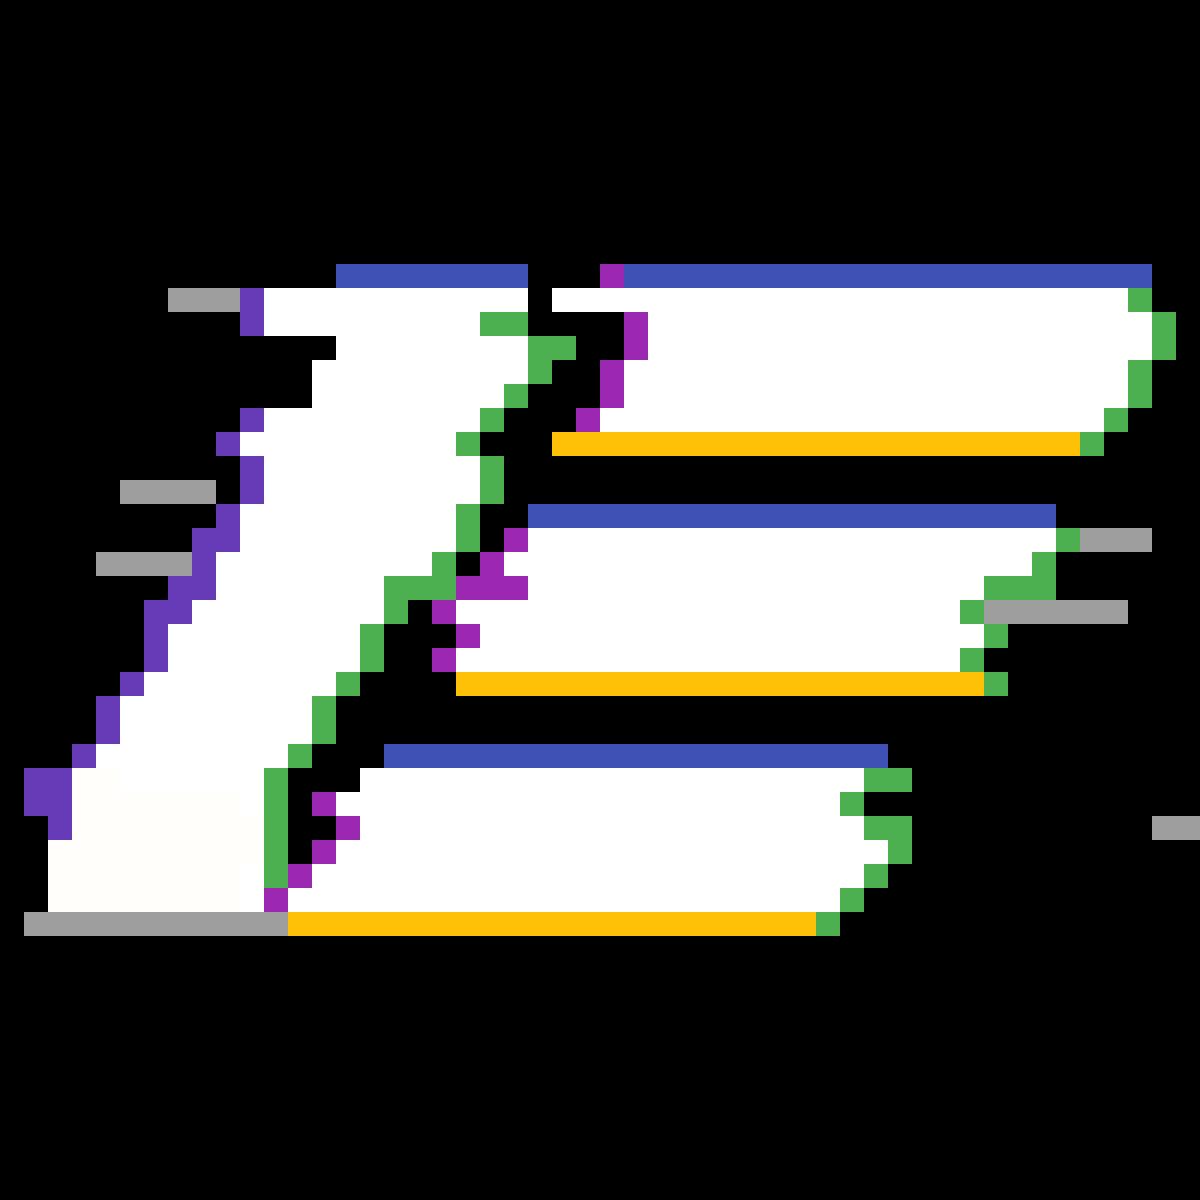 EWNetwork 8-Bit by Tunderous